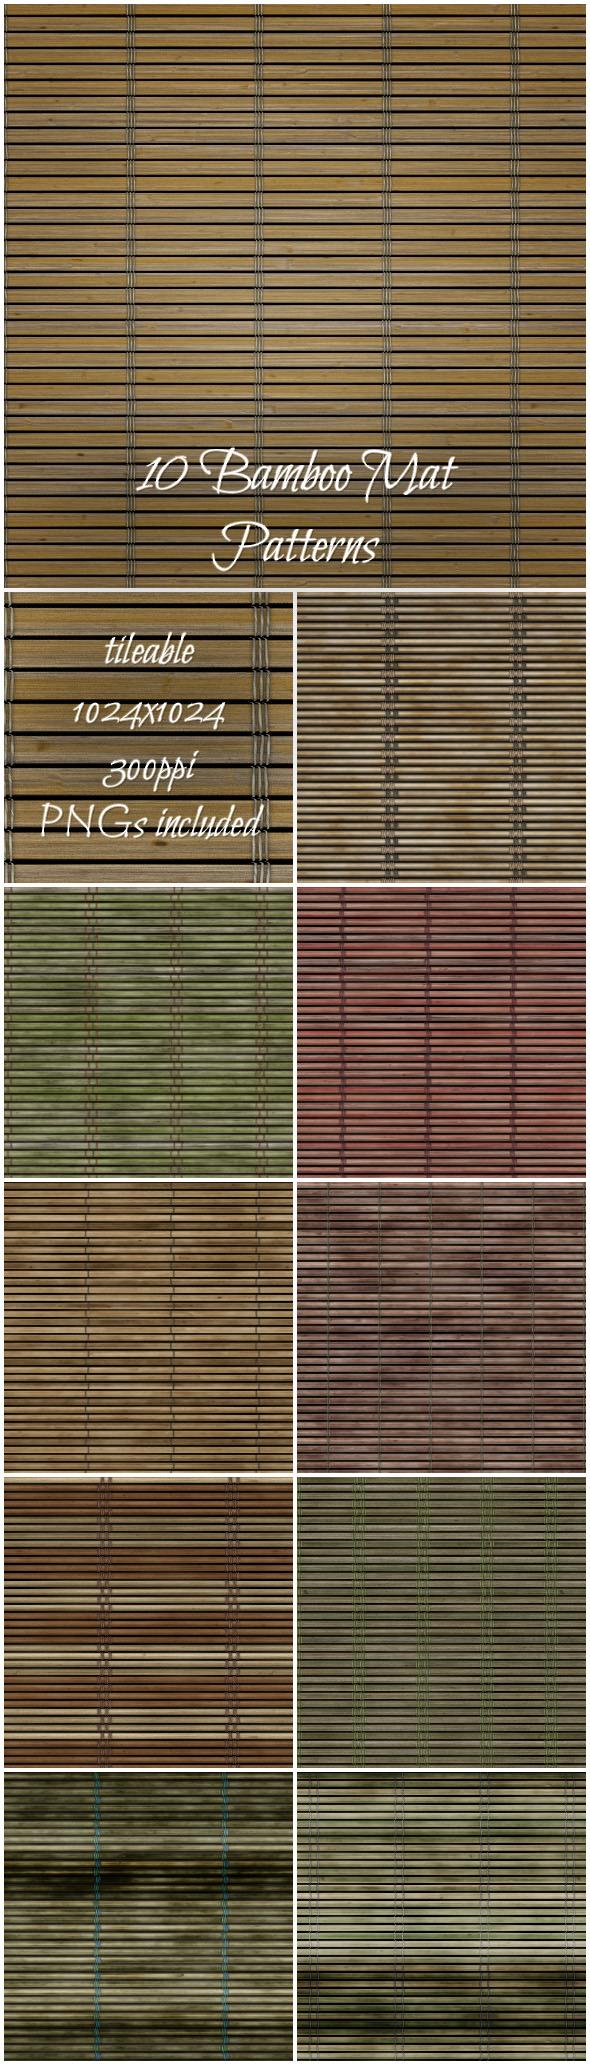 10 Bamboo Mat Patterns - Nature Textures / Fills / Patterns